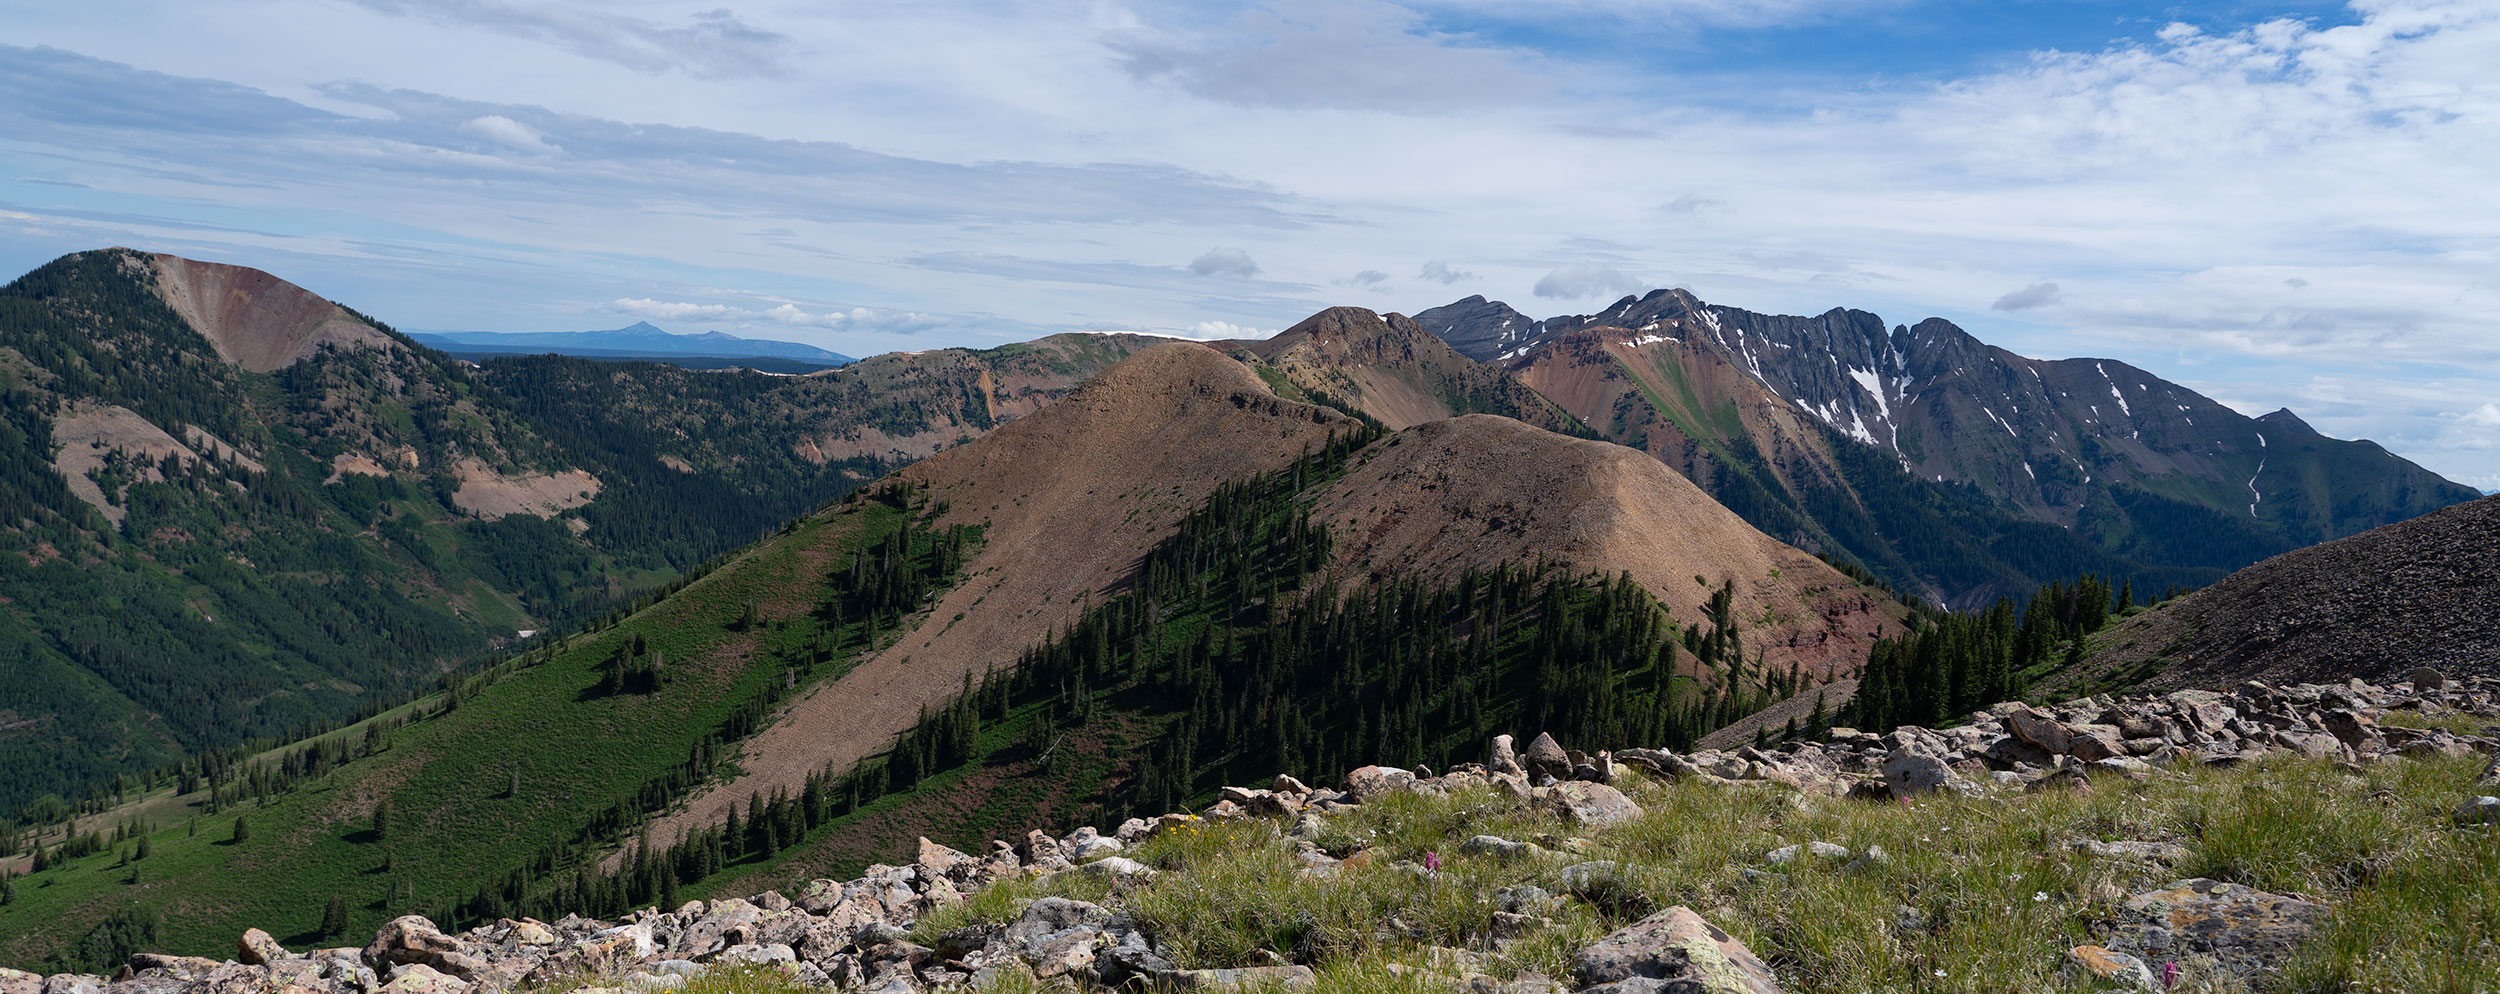 Top of Madden Peak - Copyright Debbie Devereaux Photography